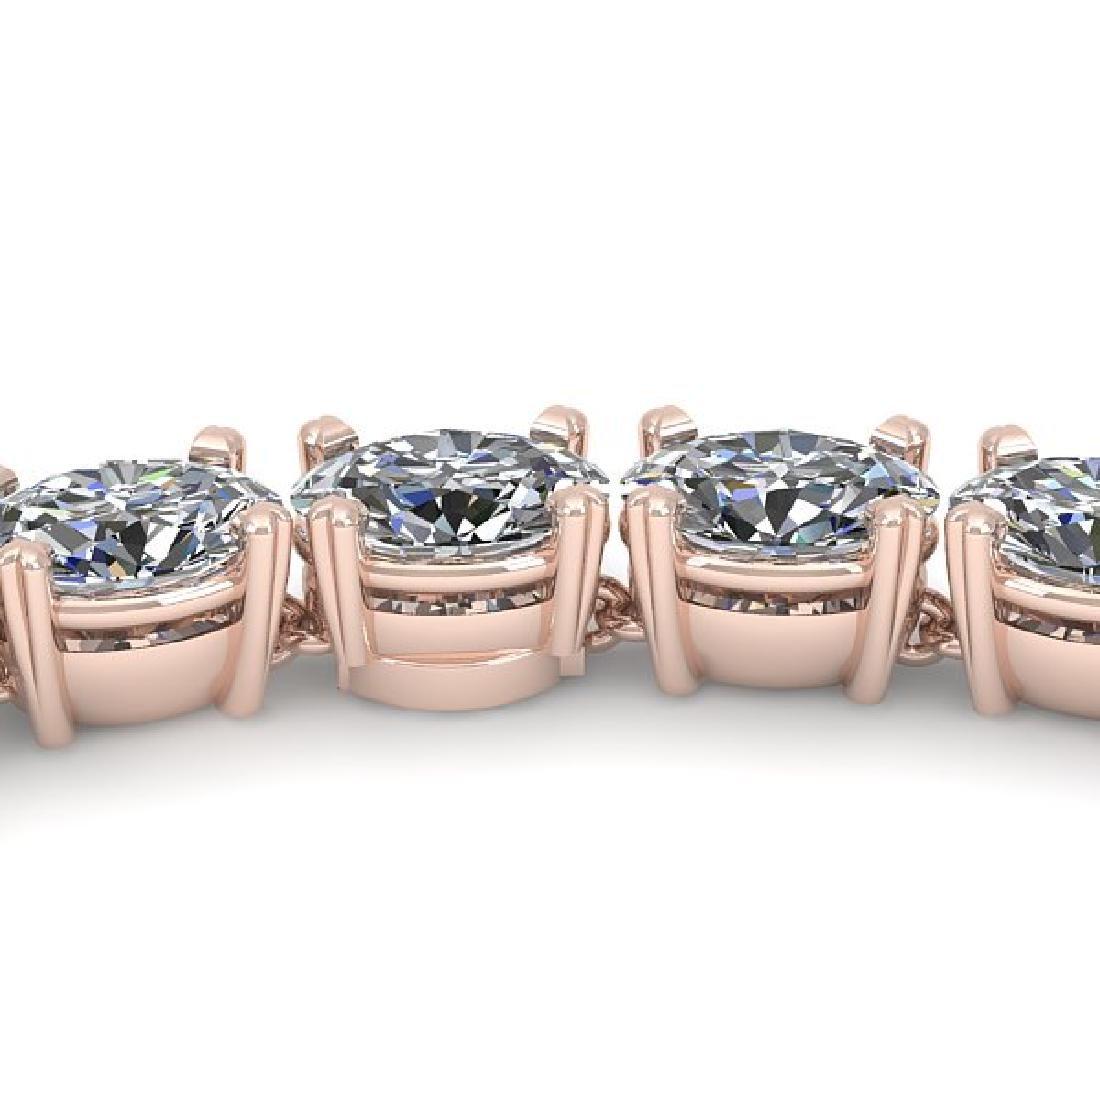 30 CTW Oval Cut Certified SI Diamond Necklace 14K Rose